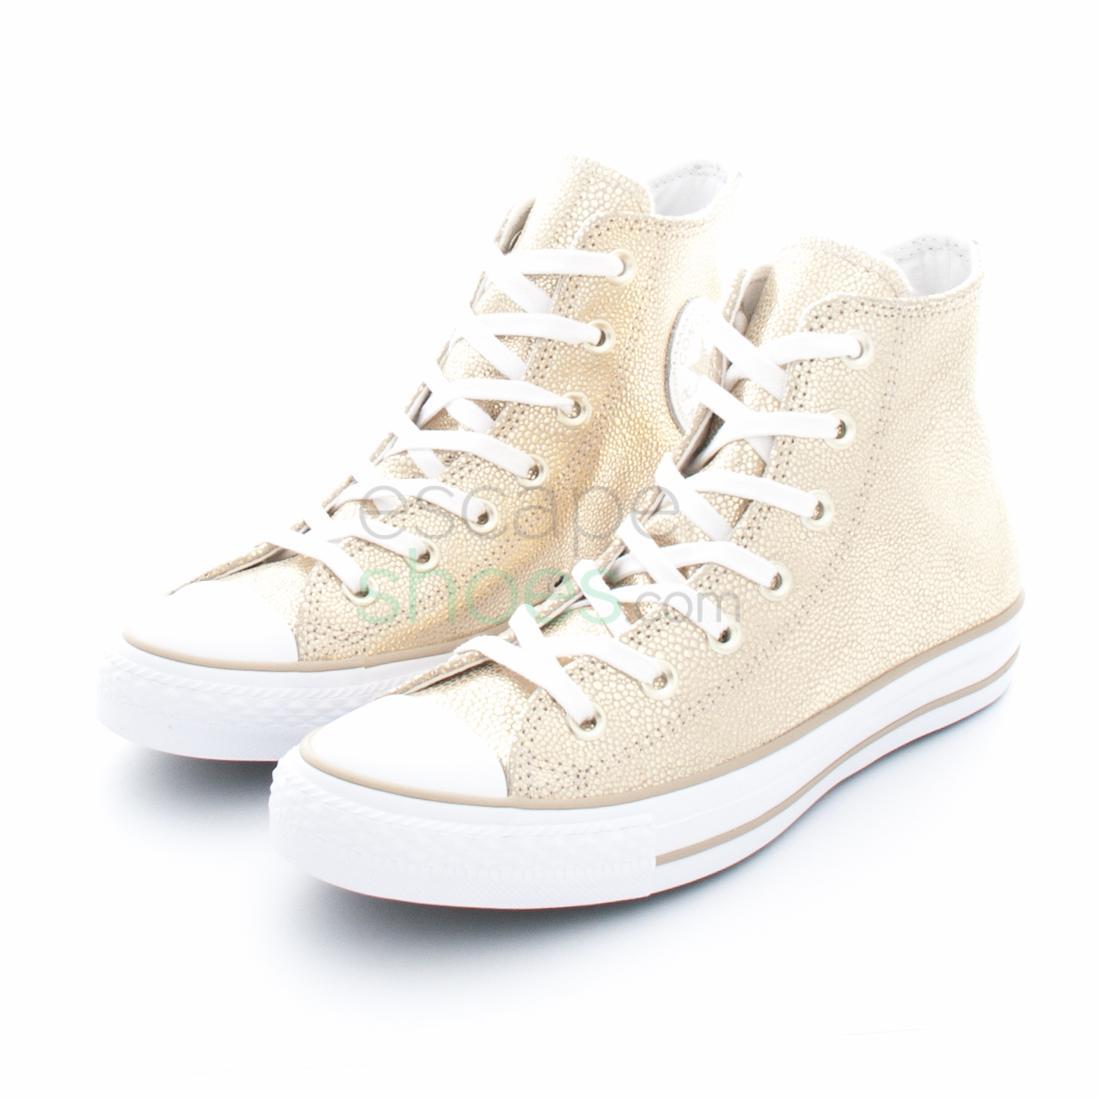 172e99ec7f1 Sneakers CONVERSE Chuck Taylor All Star 553344C Stingray Metallic Hi Light  Gold